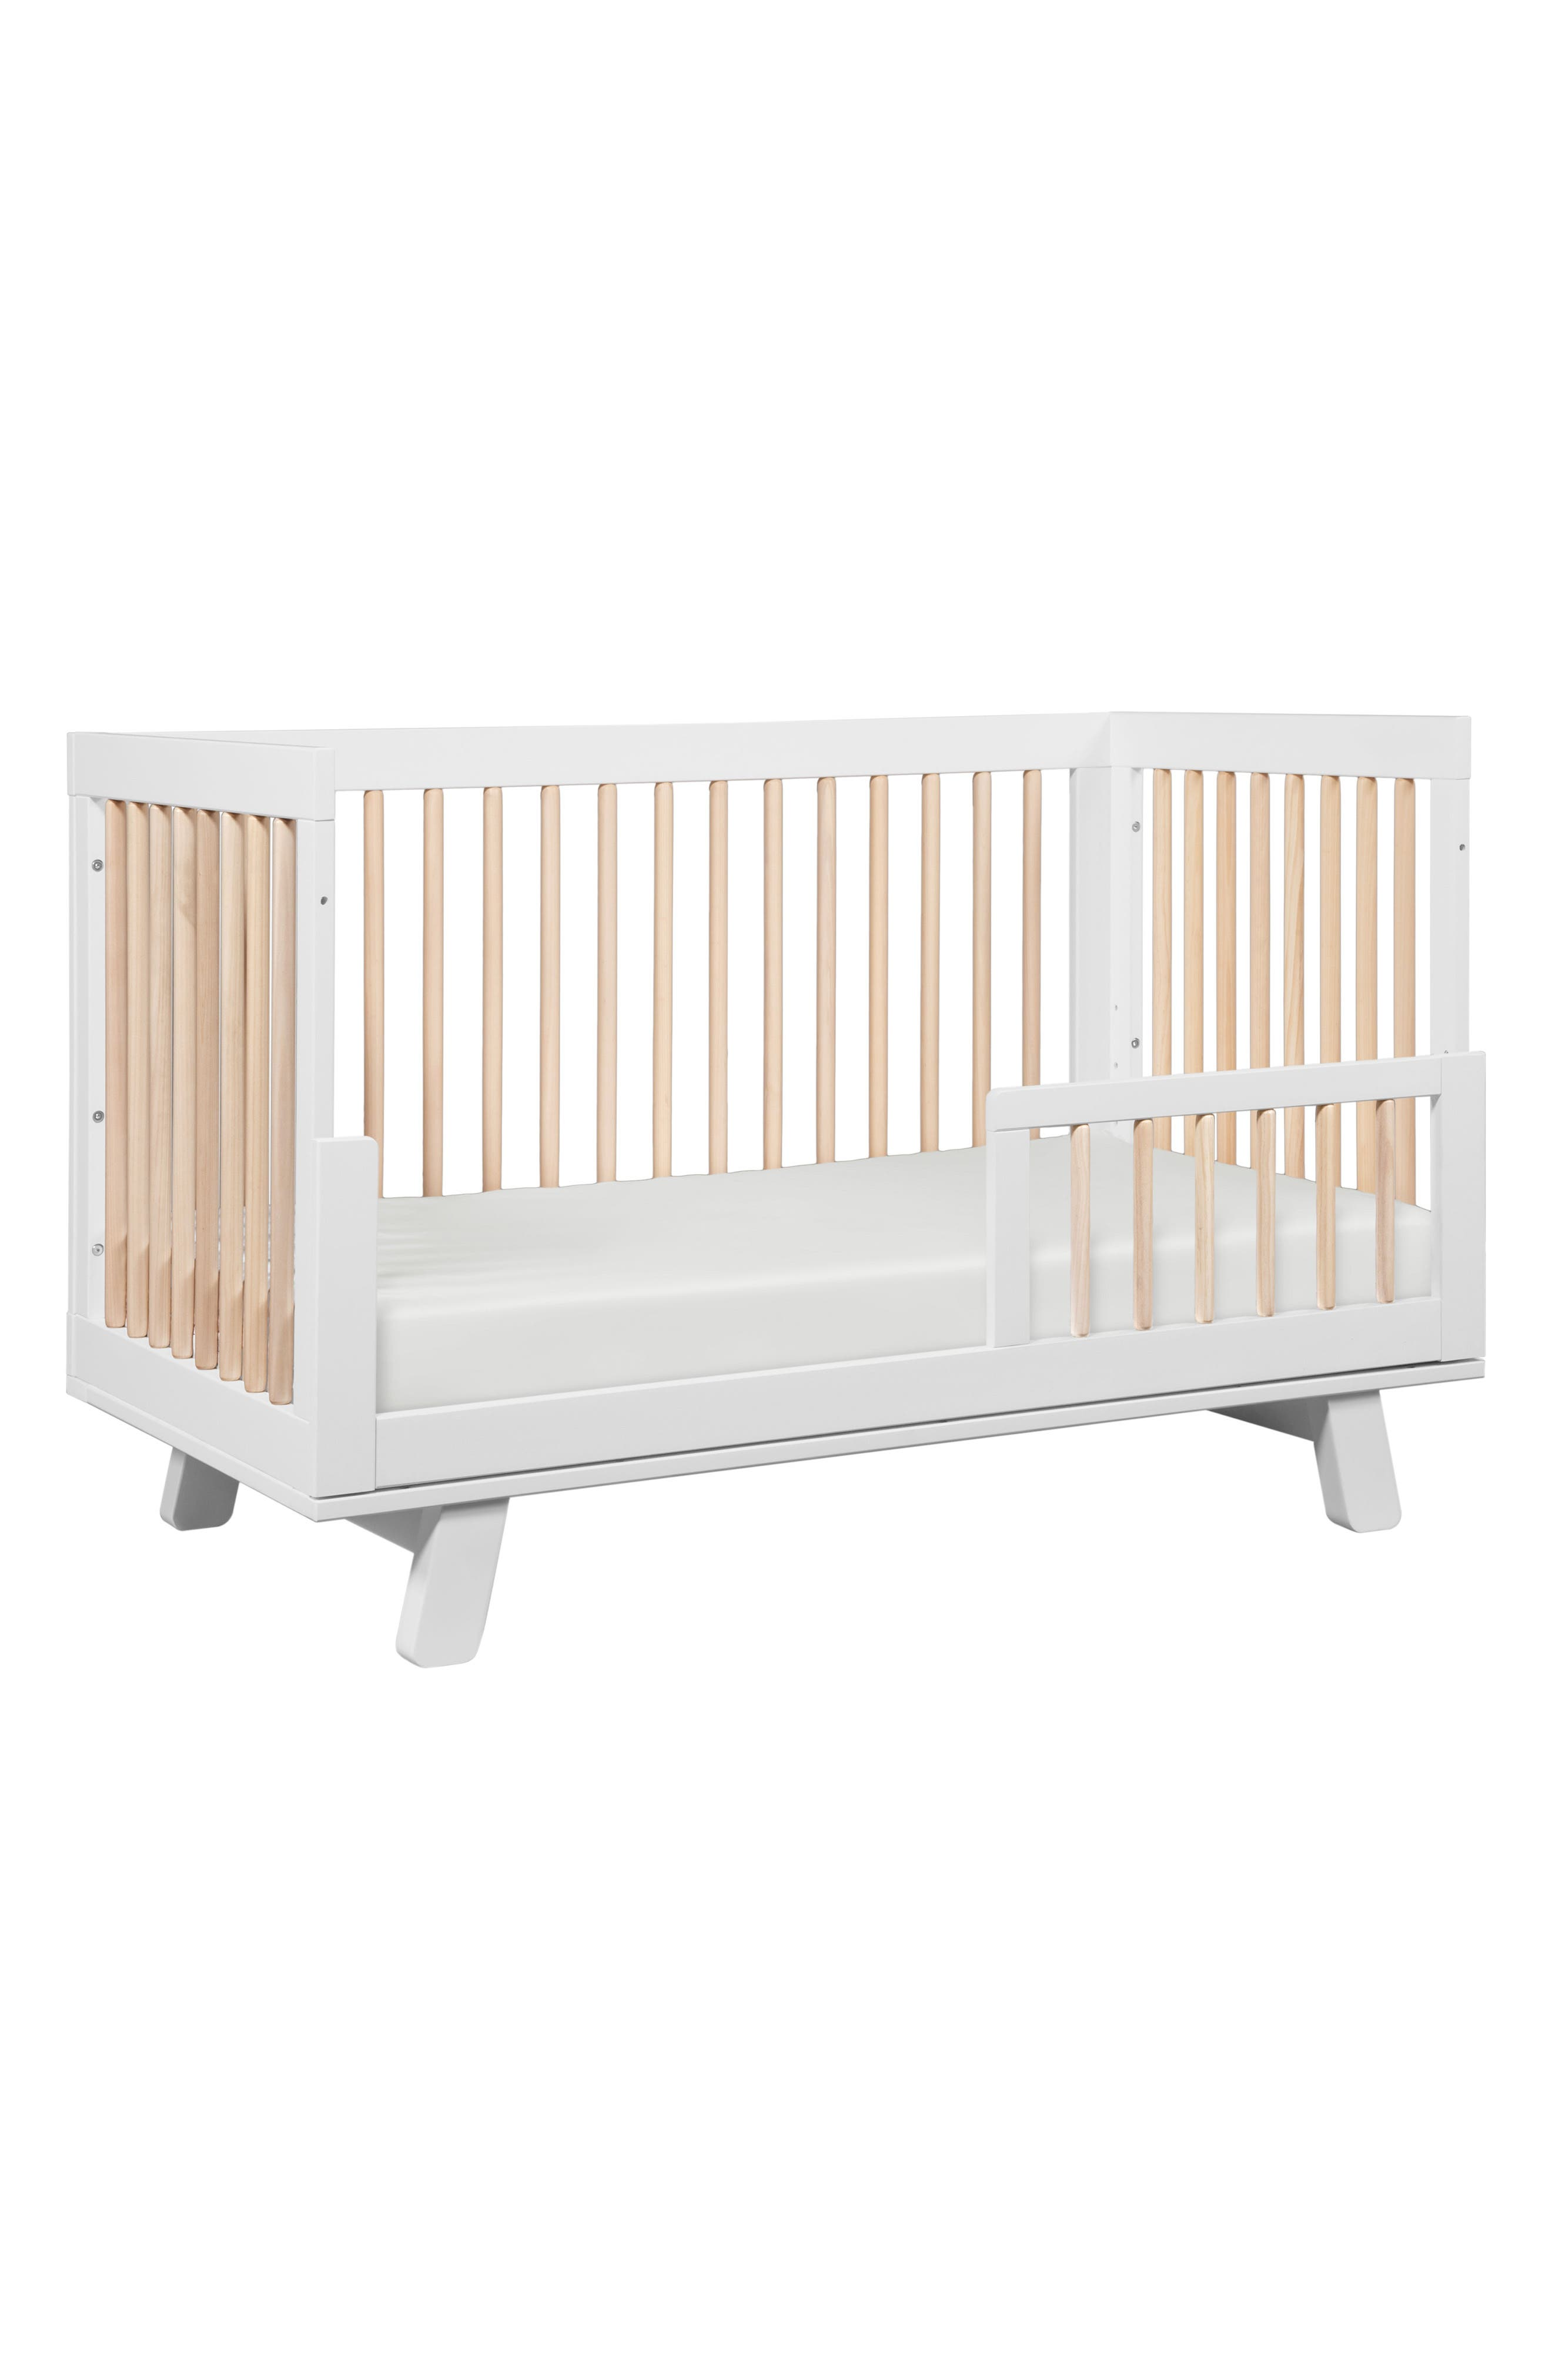 'Hudson' 3-in-1 Convertible Crib,                             Alternate thumbnail 26, color,